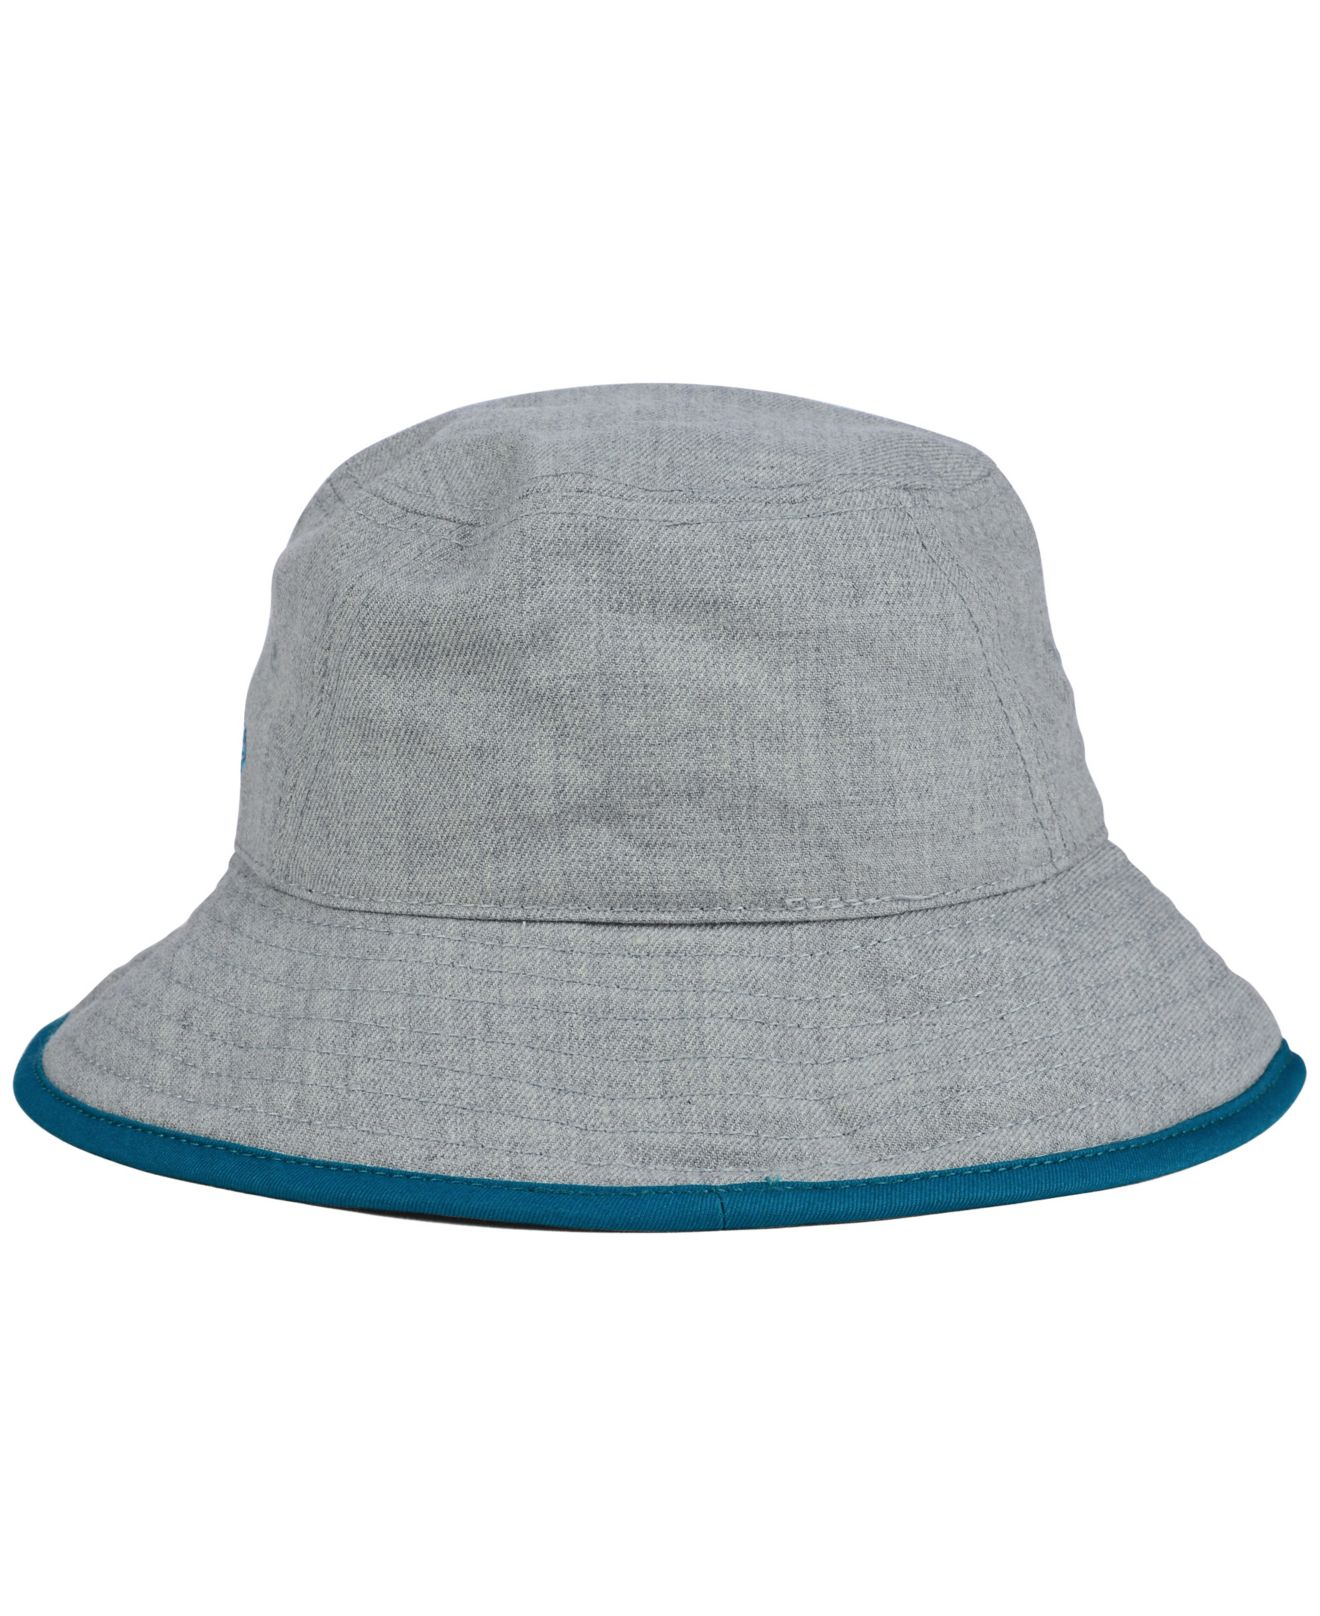 65b8625a44a Lyst - KTZ Jacksonville Jaguars Nfl Heather Gray Bucket Hat in Gray